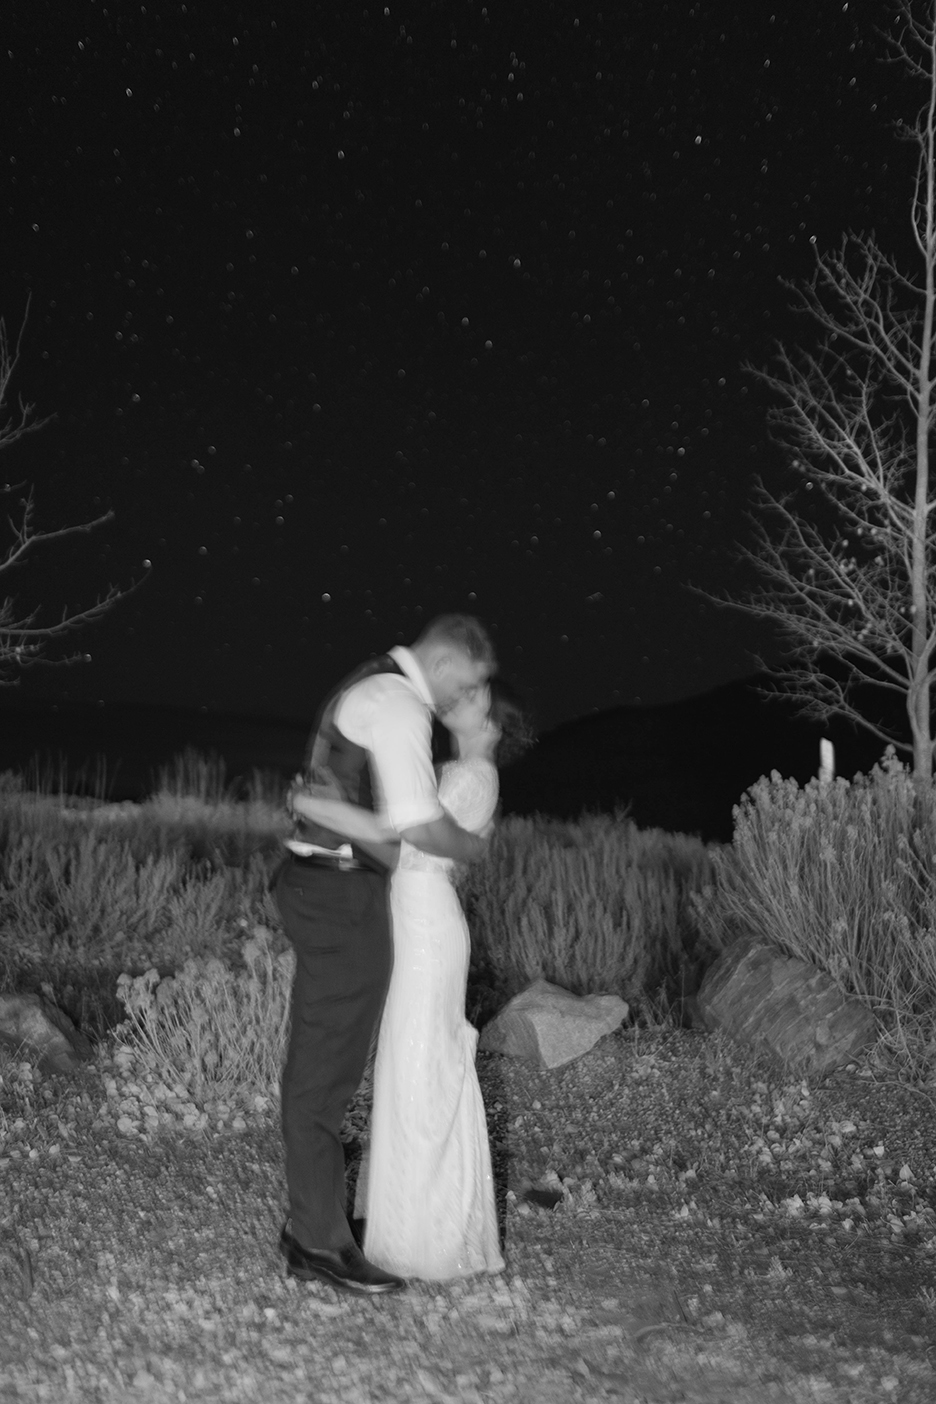 los_angeles_wedding_photographer 25.jpg